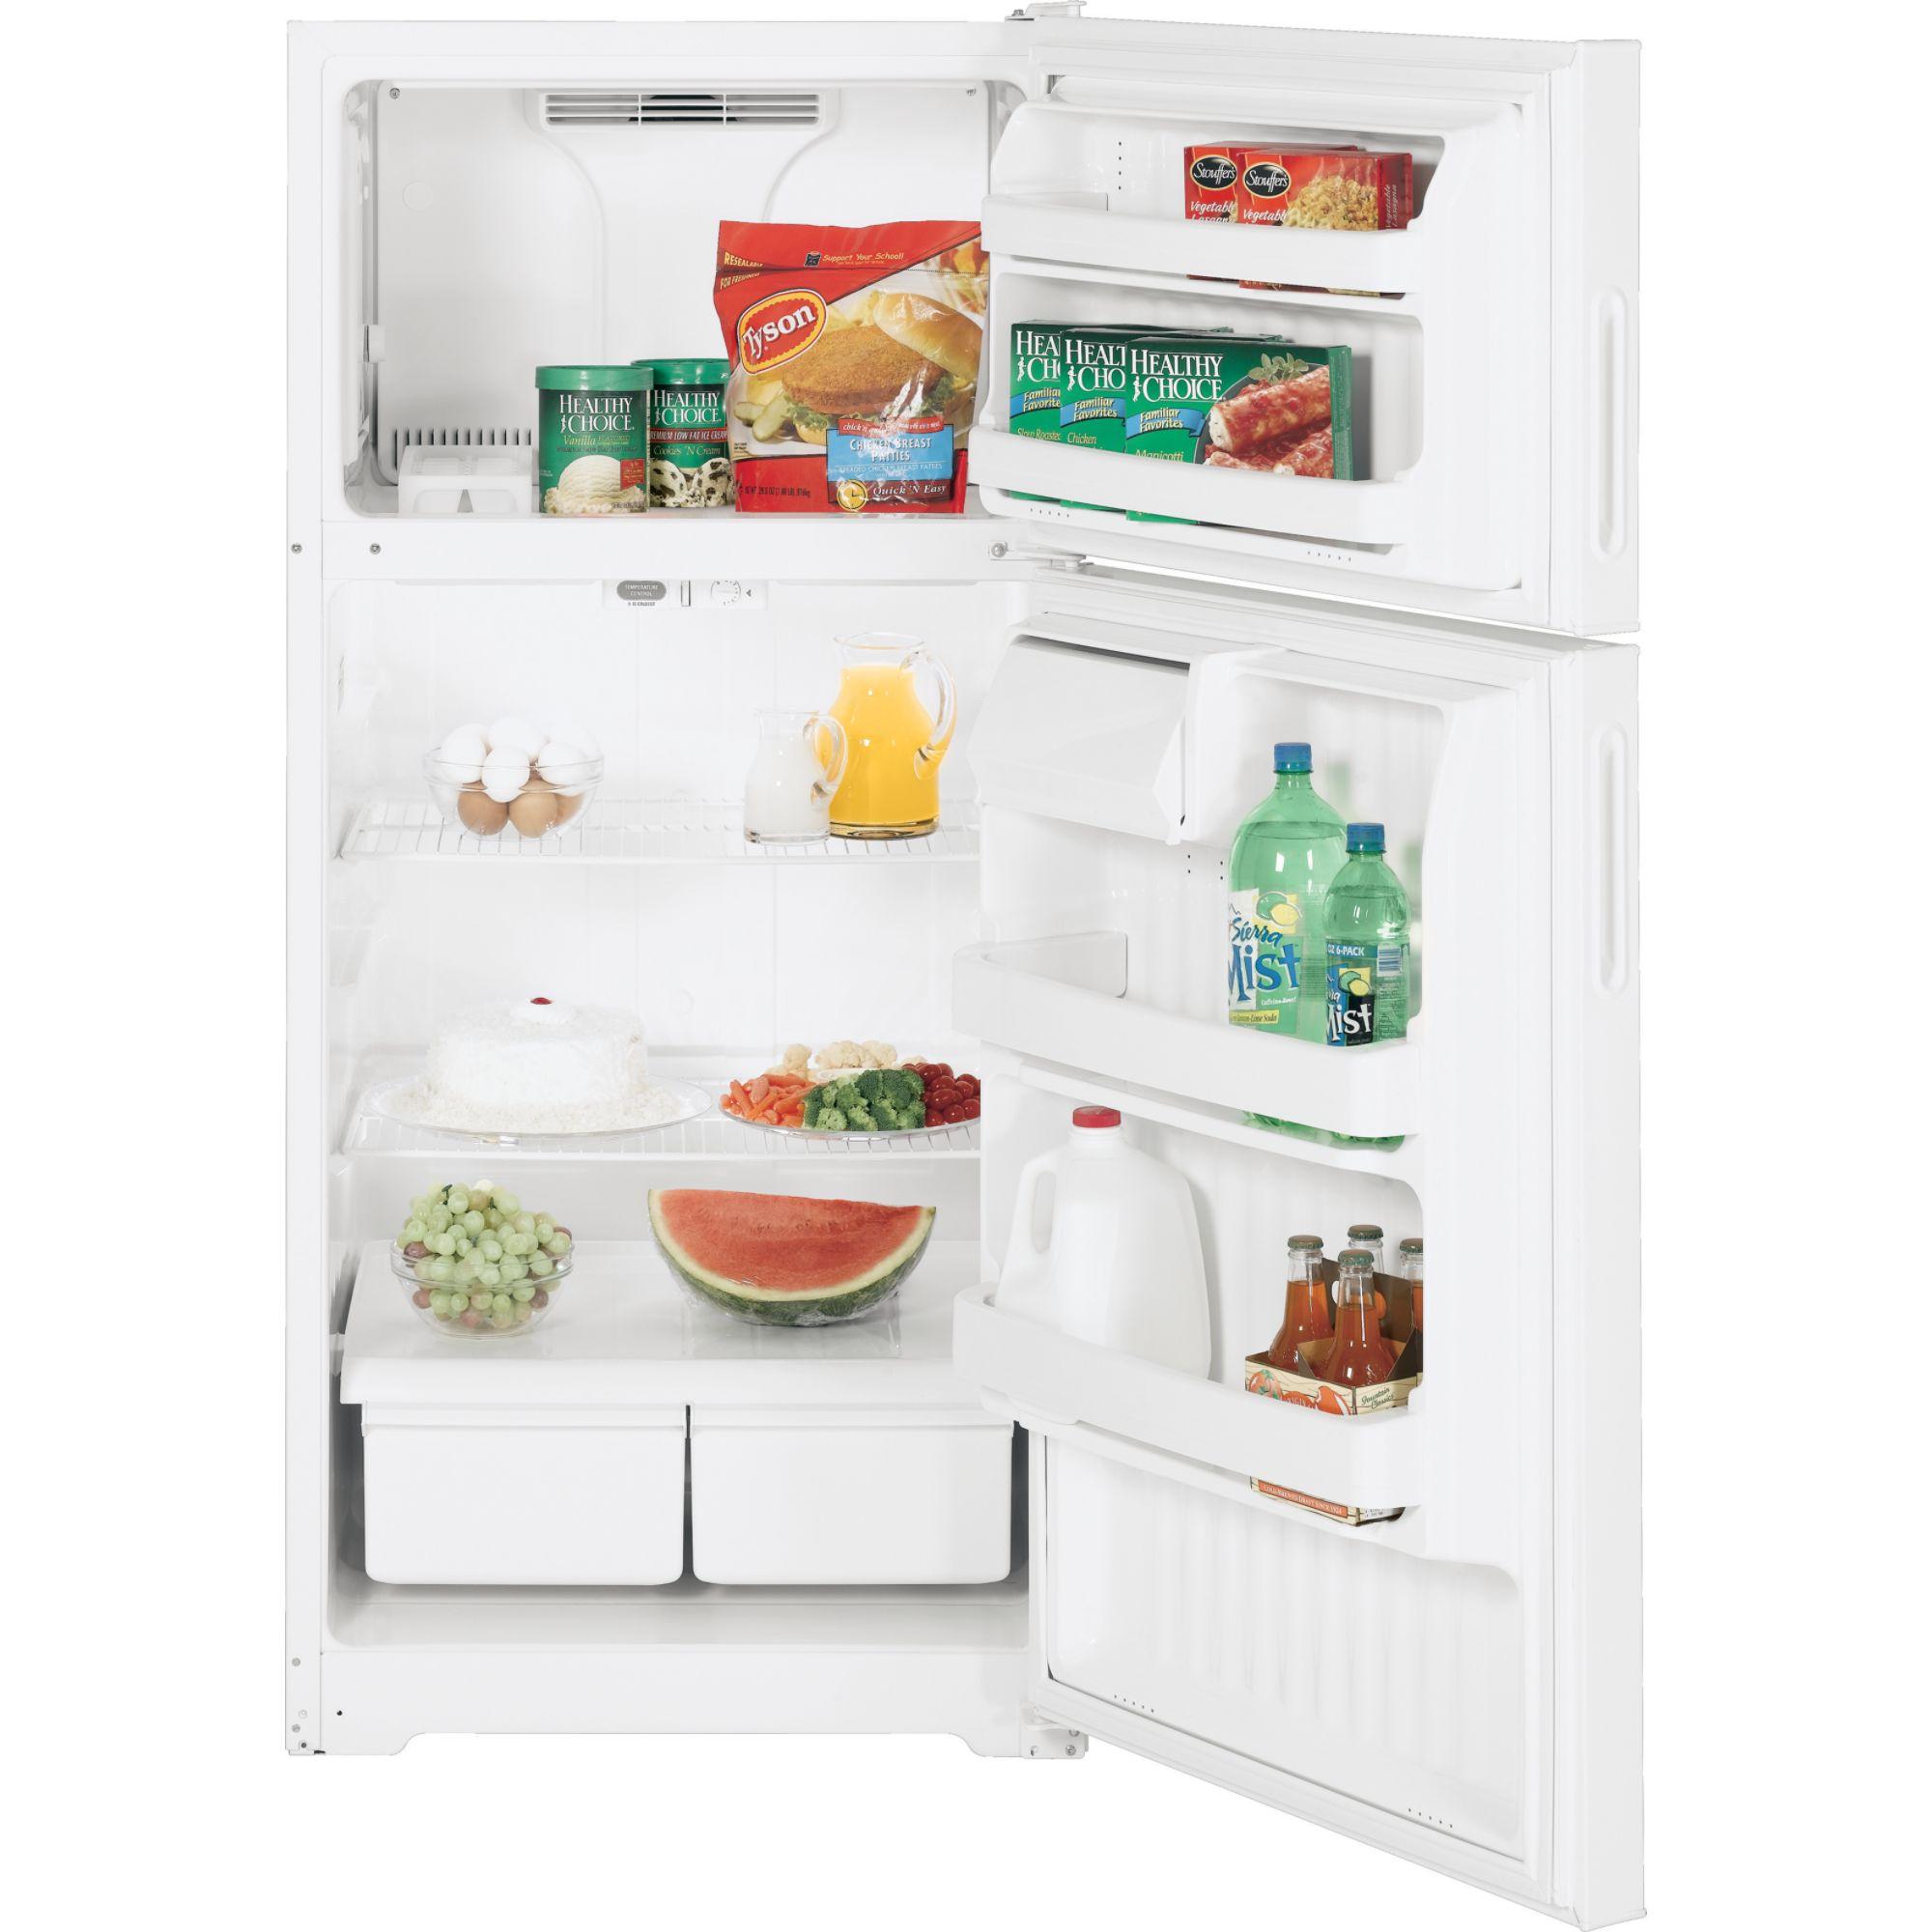 GE 15.7 cu. ft. Top Freezer Refrigerator (GTR16BBSR)